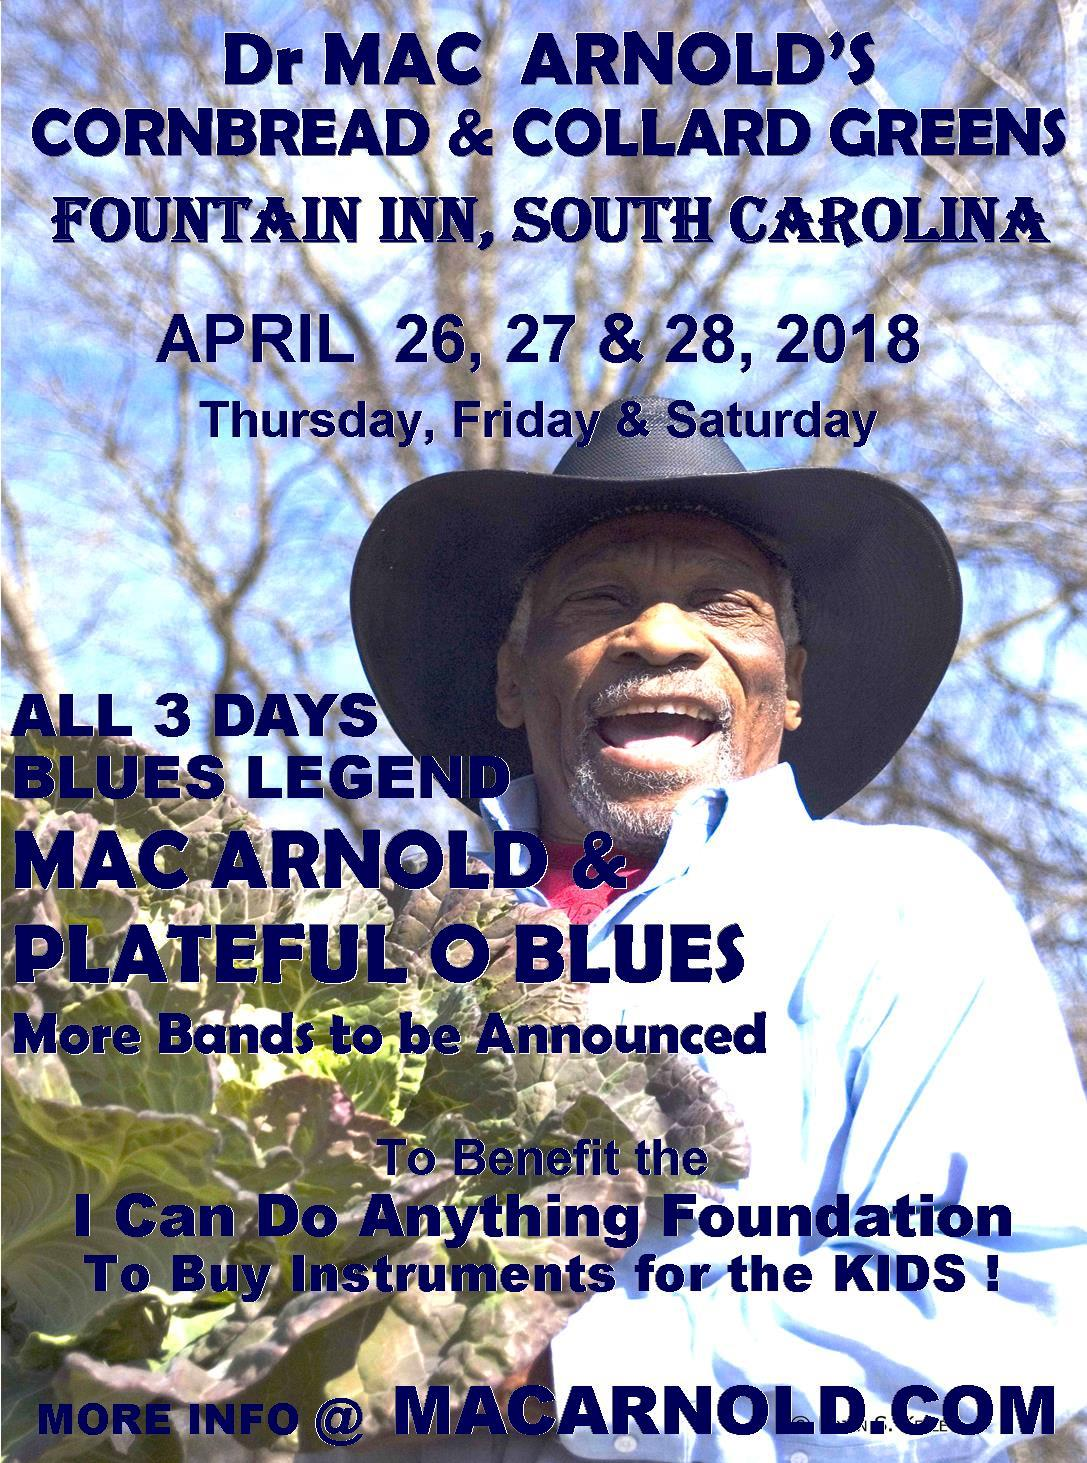 2018 - April 26-28 Festival